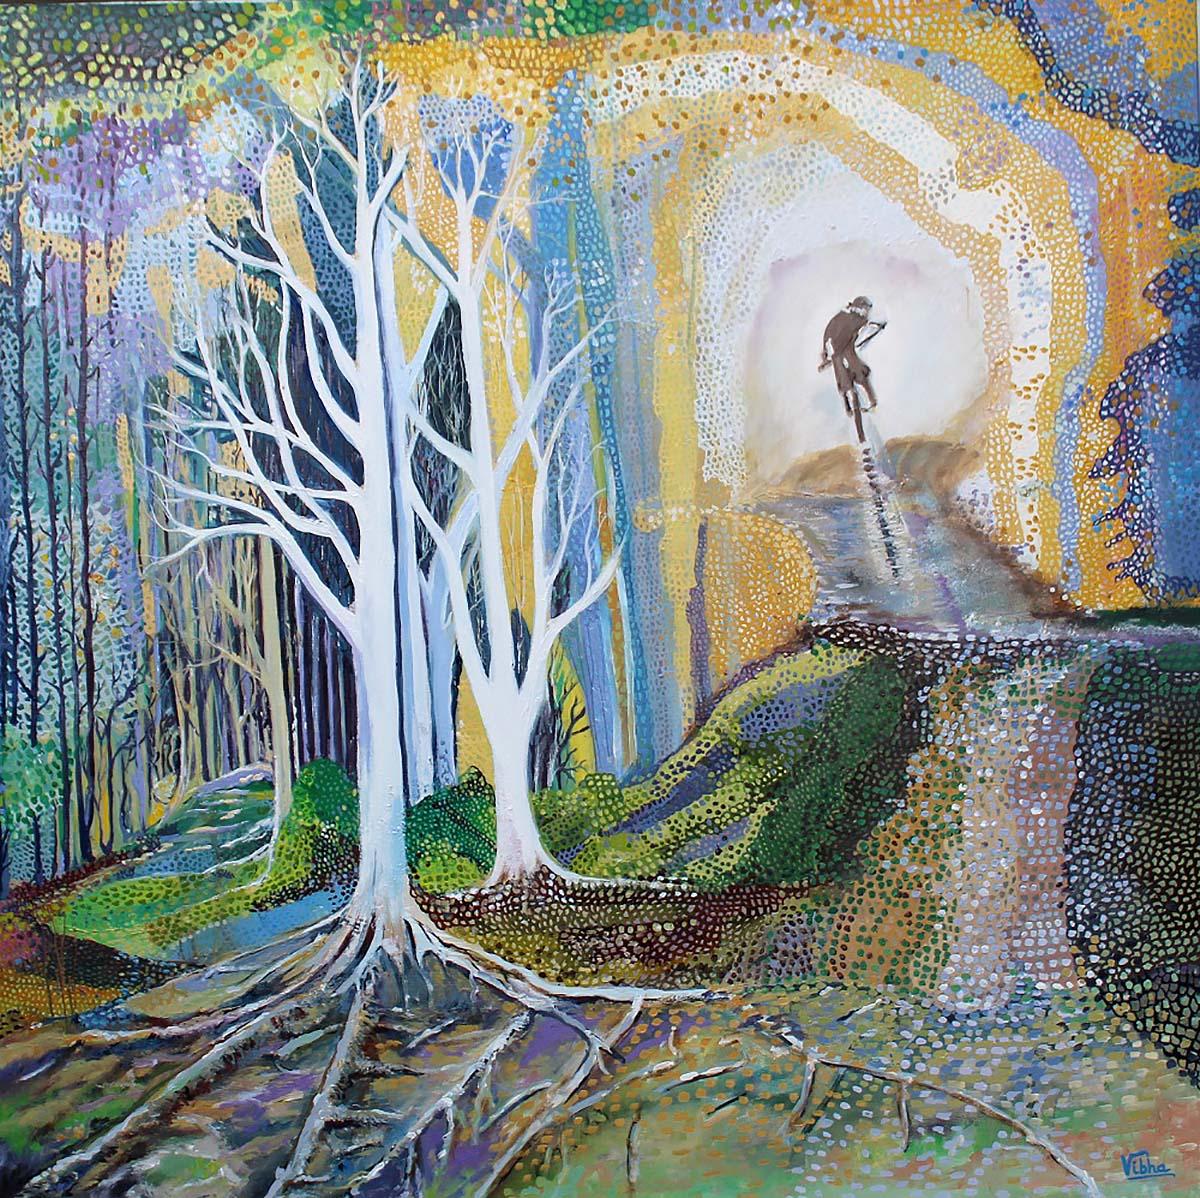 Vibha Pankaj, 'Boundless Bounty', oil on canvas